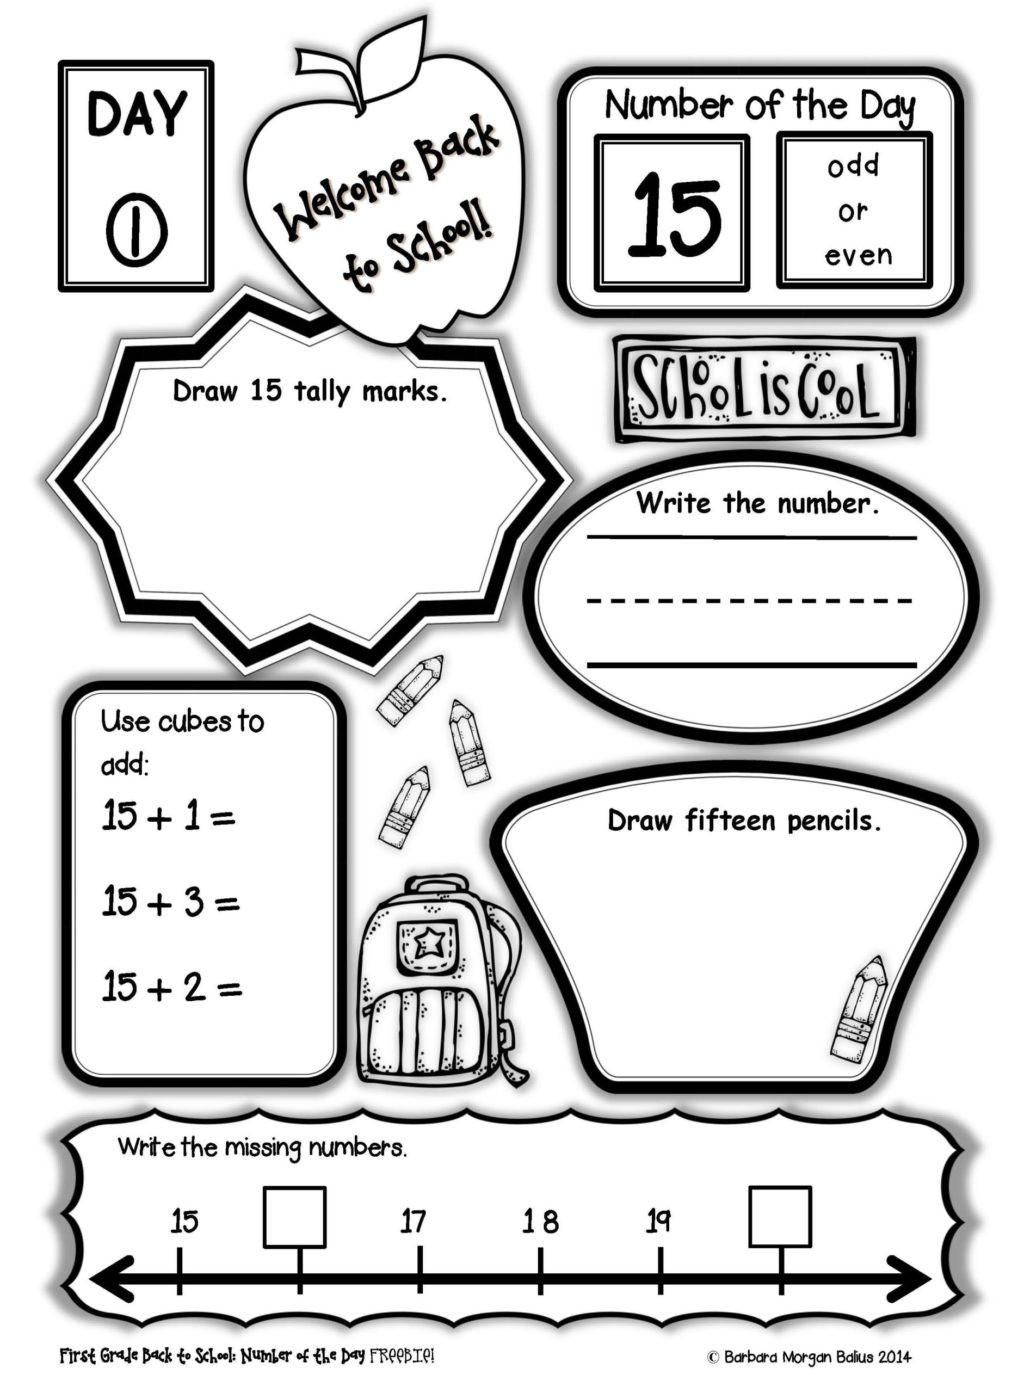 30 Main Idea Worksheet 2nd Grade